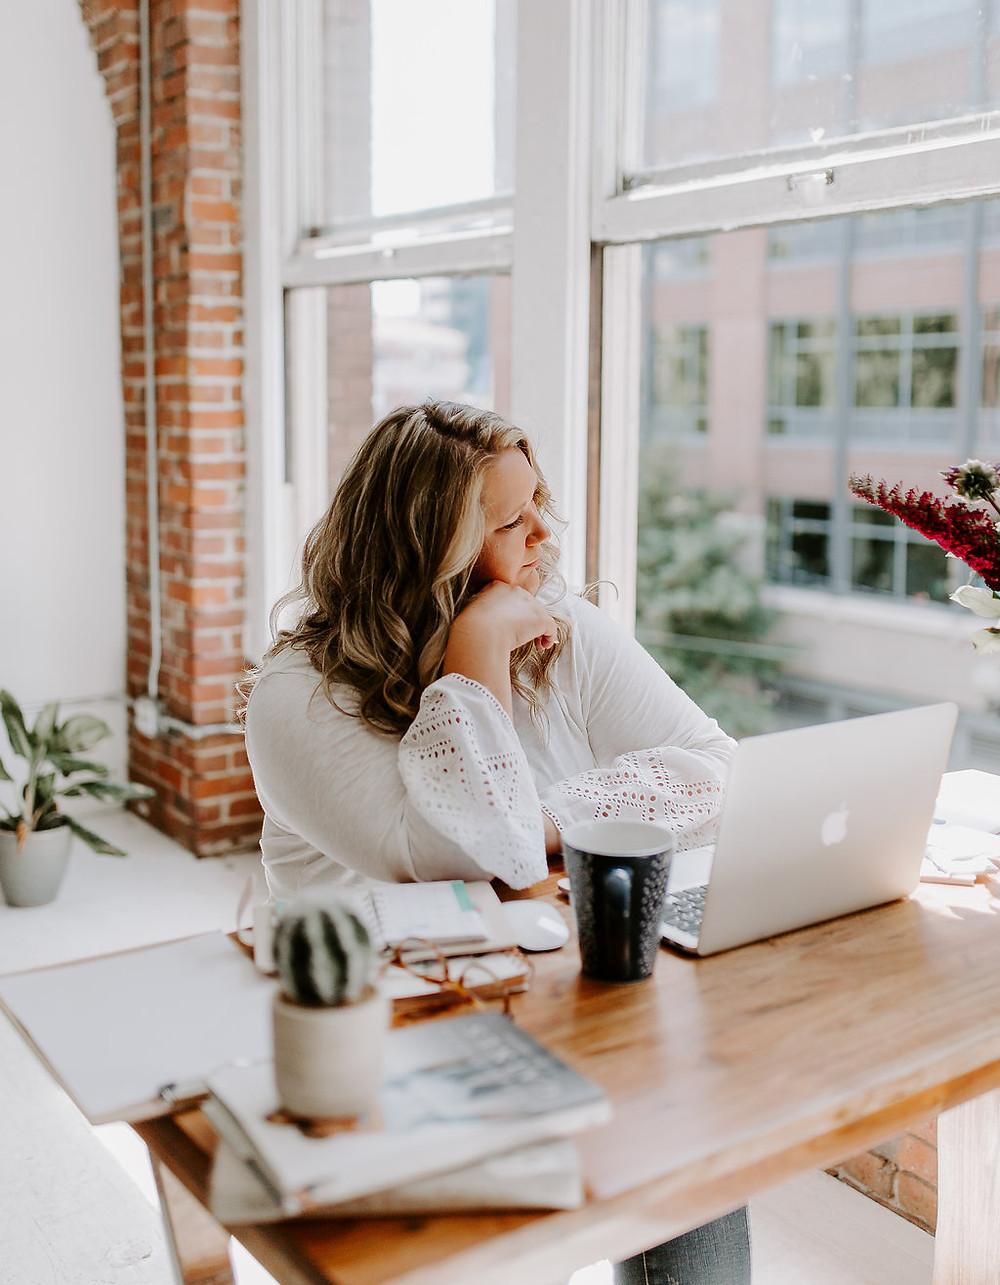 Web Design Blogger Giving Business Inspiration in Washington State by Ashley Lasken